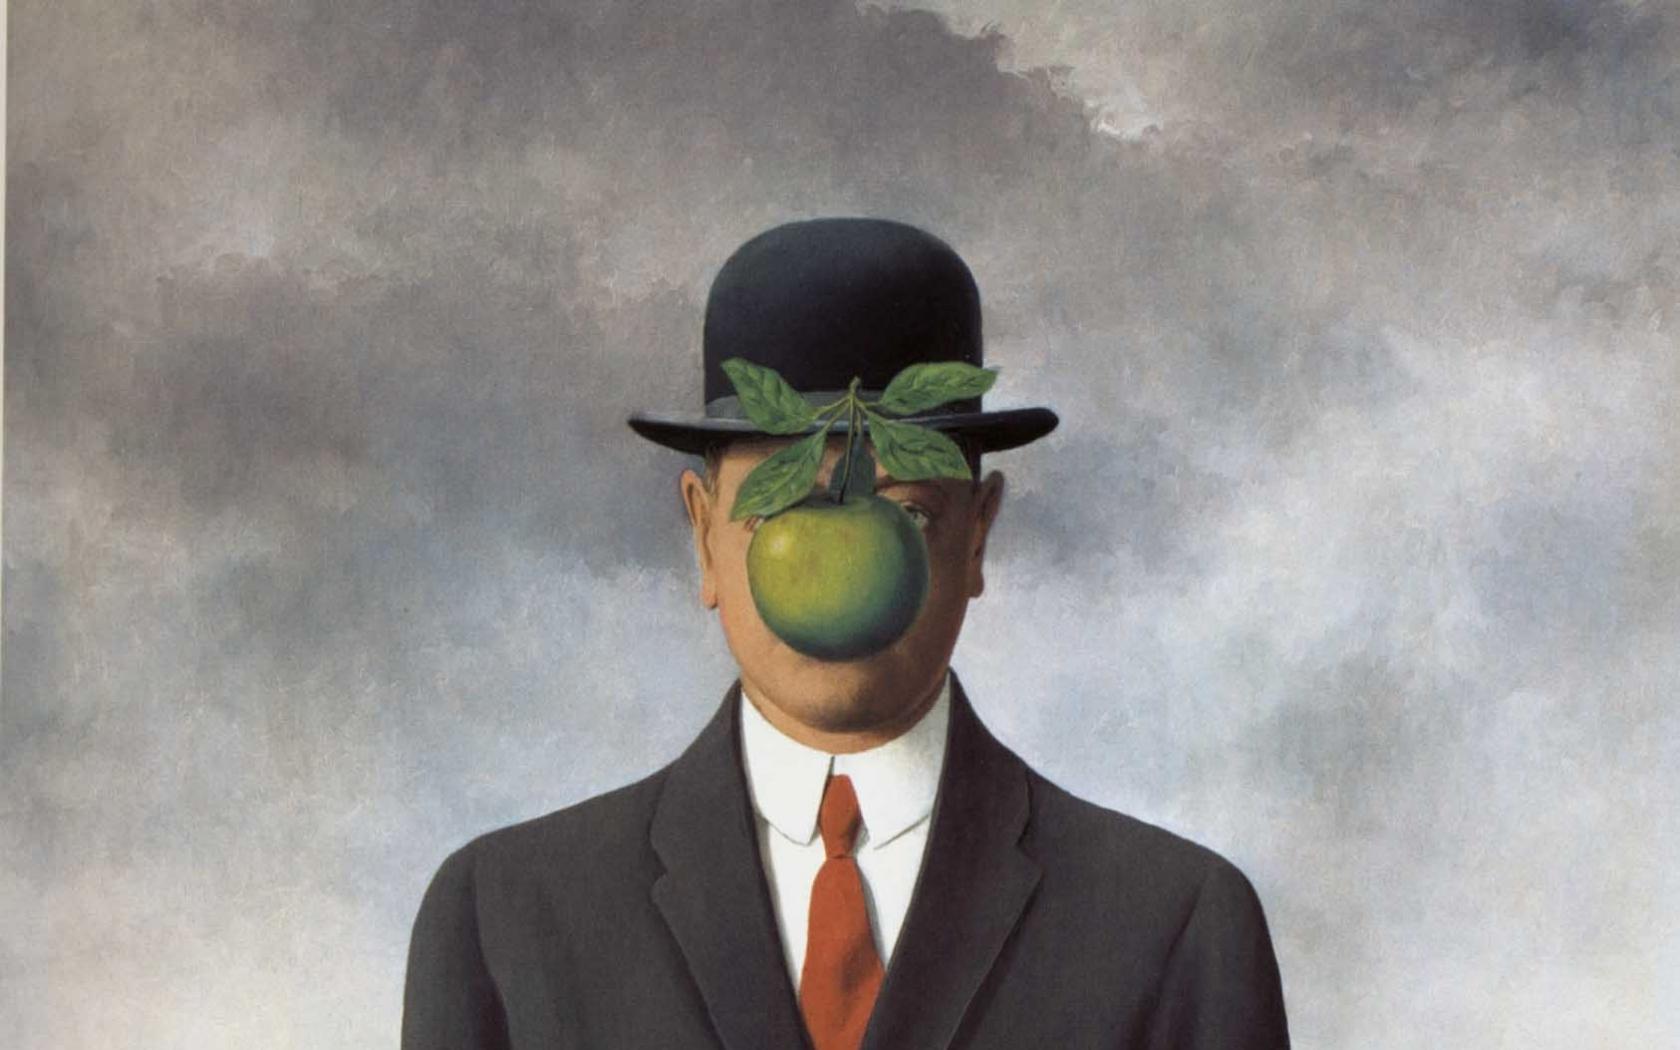 rene magritte son of man 1686x2198 wallpaper High Quality Wallpaper 1680x1050